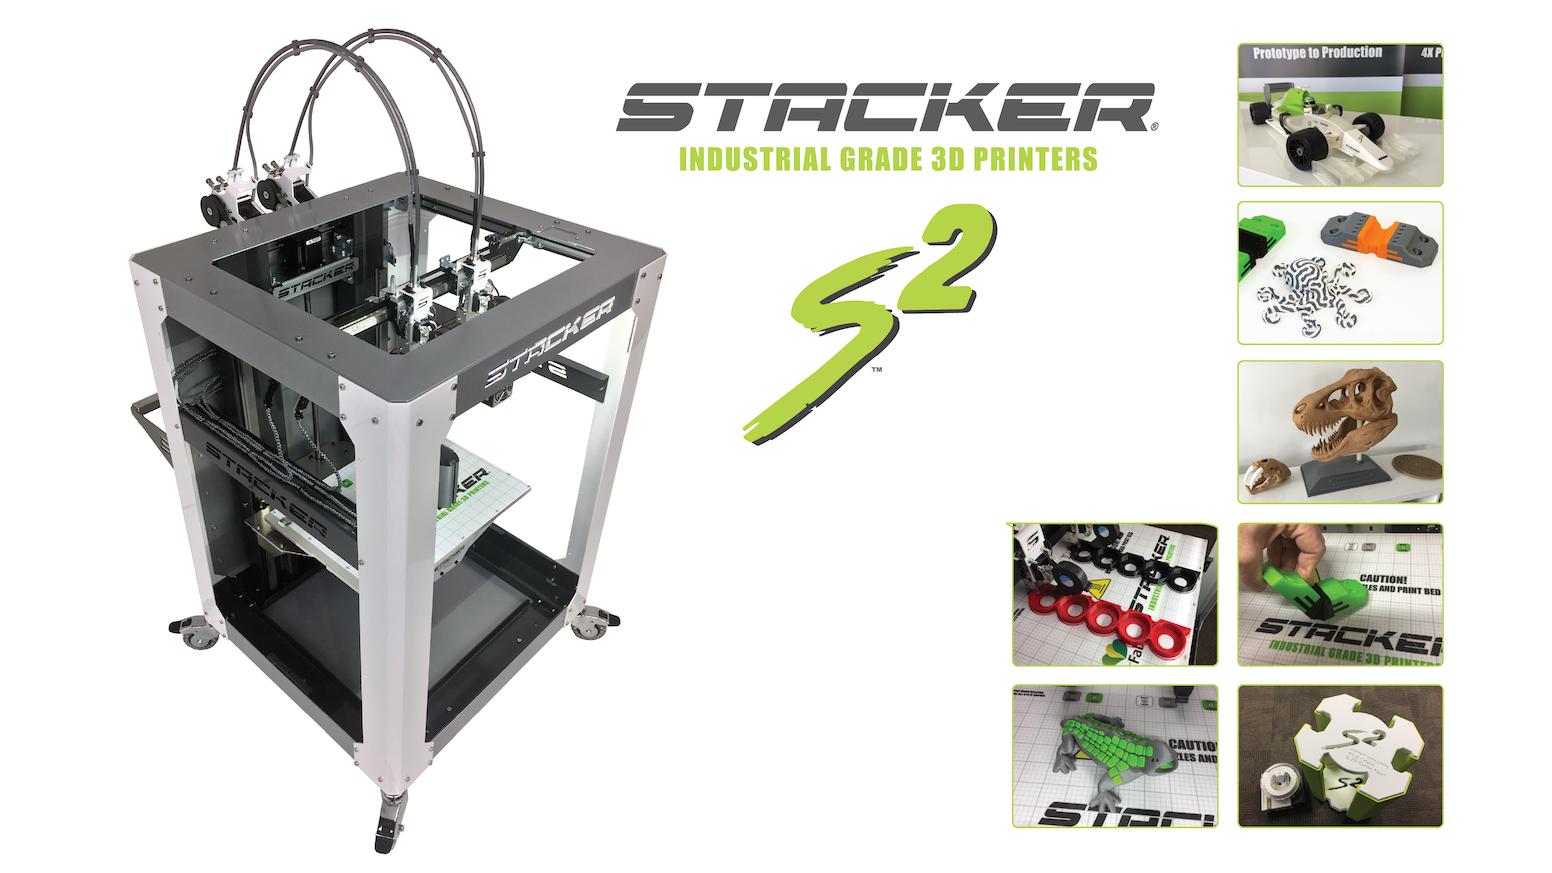 STACKER S2 - Industrial Grade 3D Printer by STACKER, LLC — Kickstarter